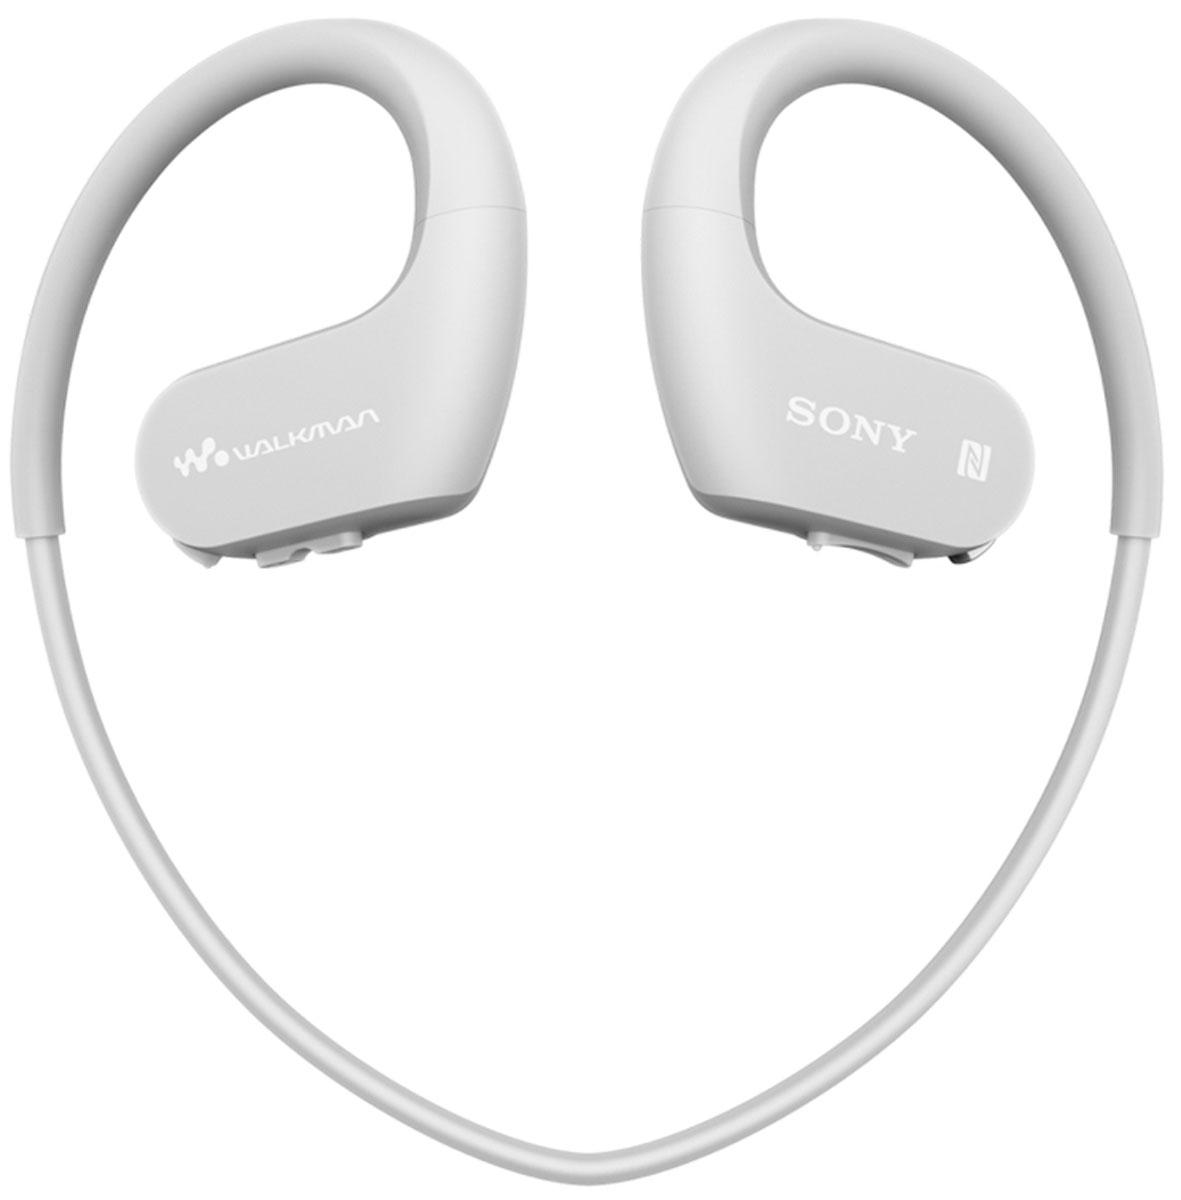 Sony NW-WS623, White МР3-плеер - MP3-плееры и диктофоны